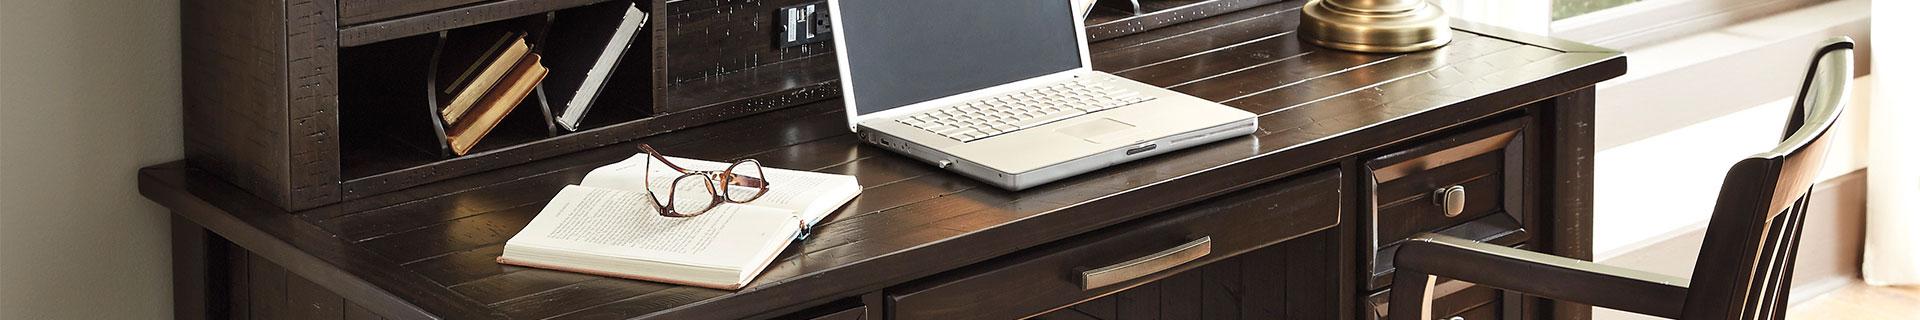 Desks, shelves and storage solutions